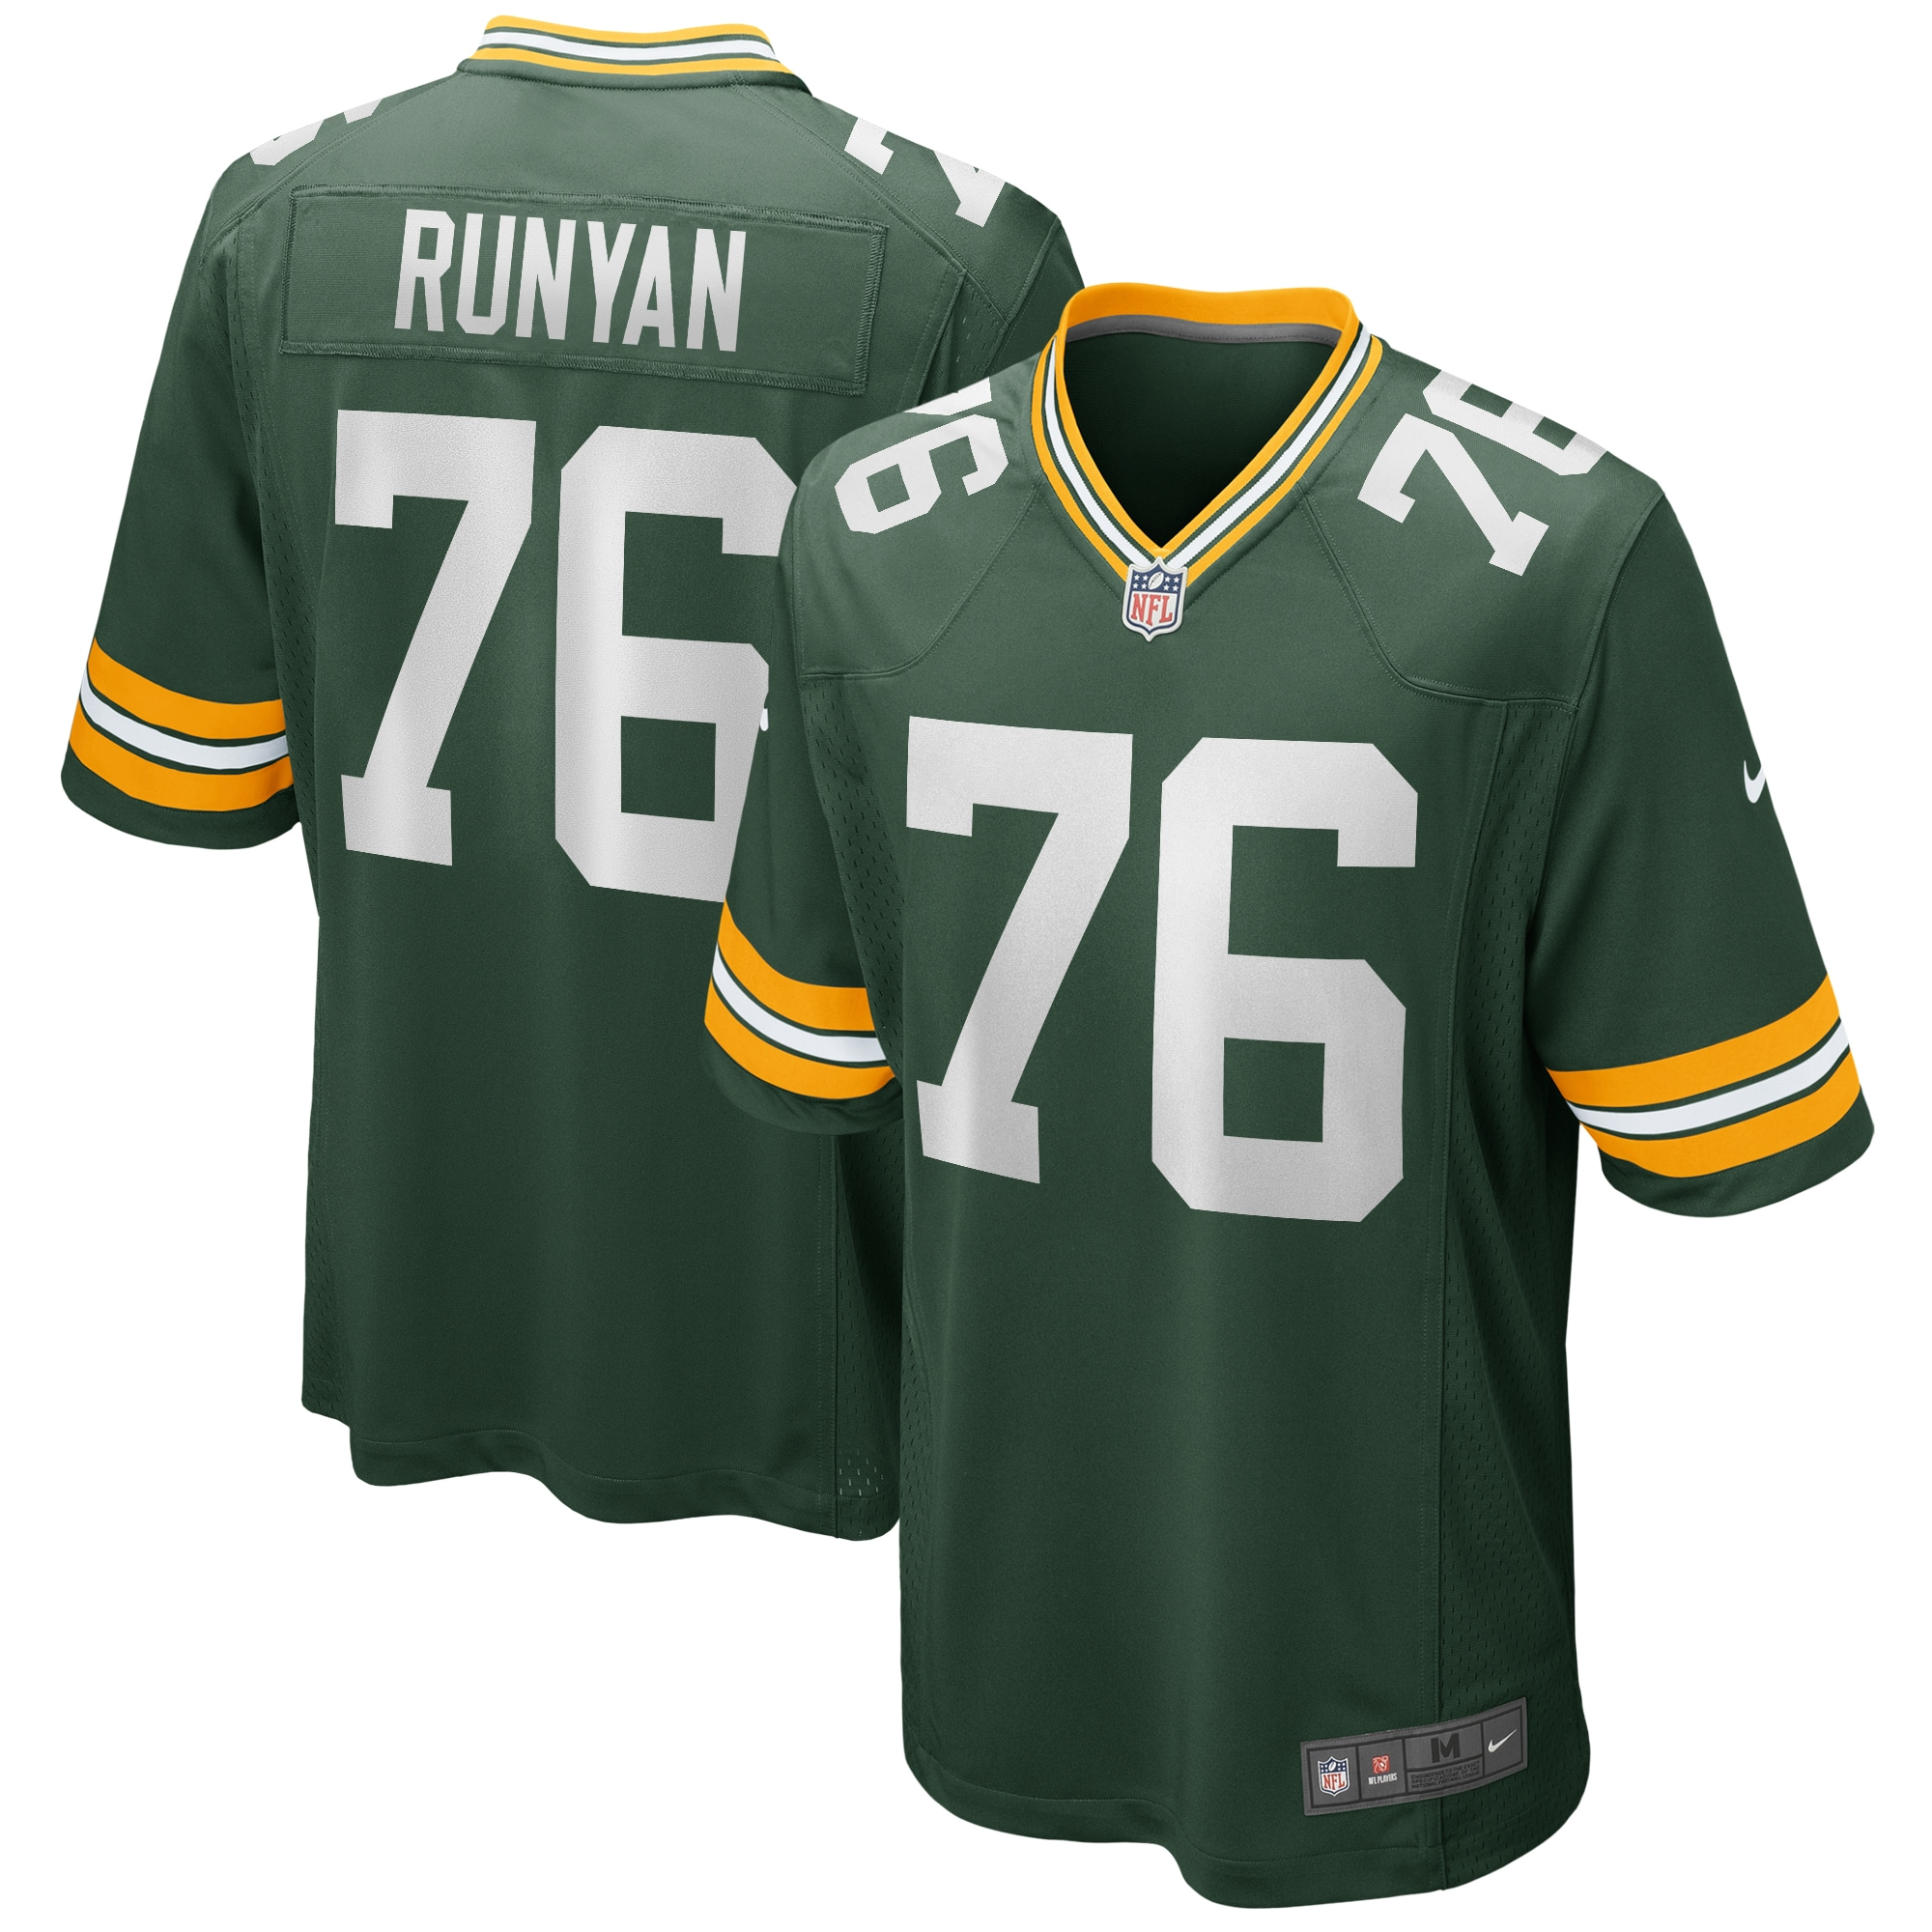 Jon Runyan Green Bay Packers Nike Player Game Jersey - Green - Walmart.com